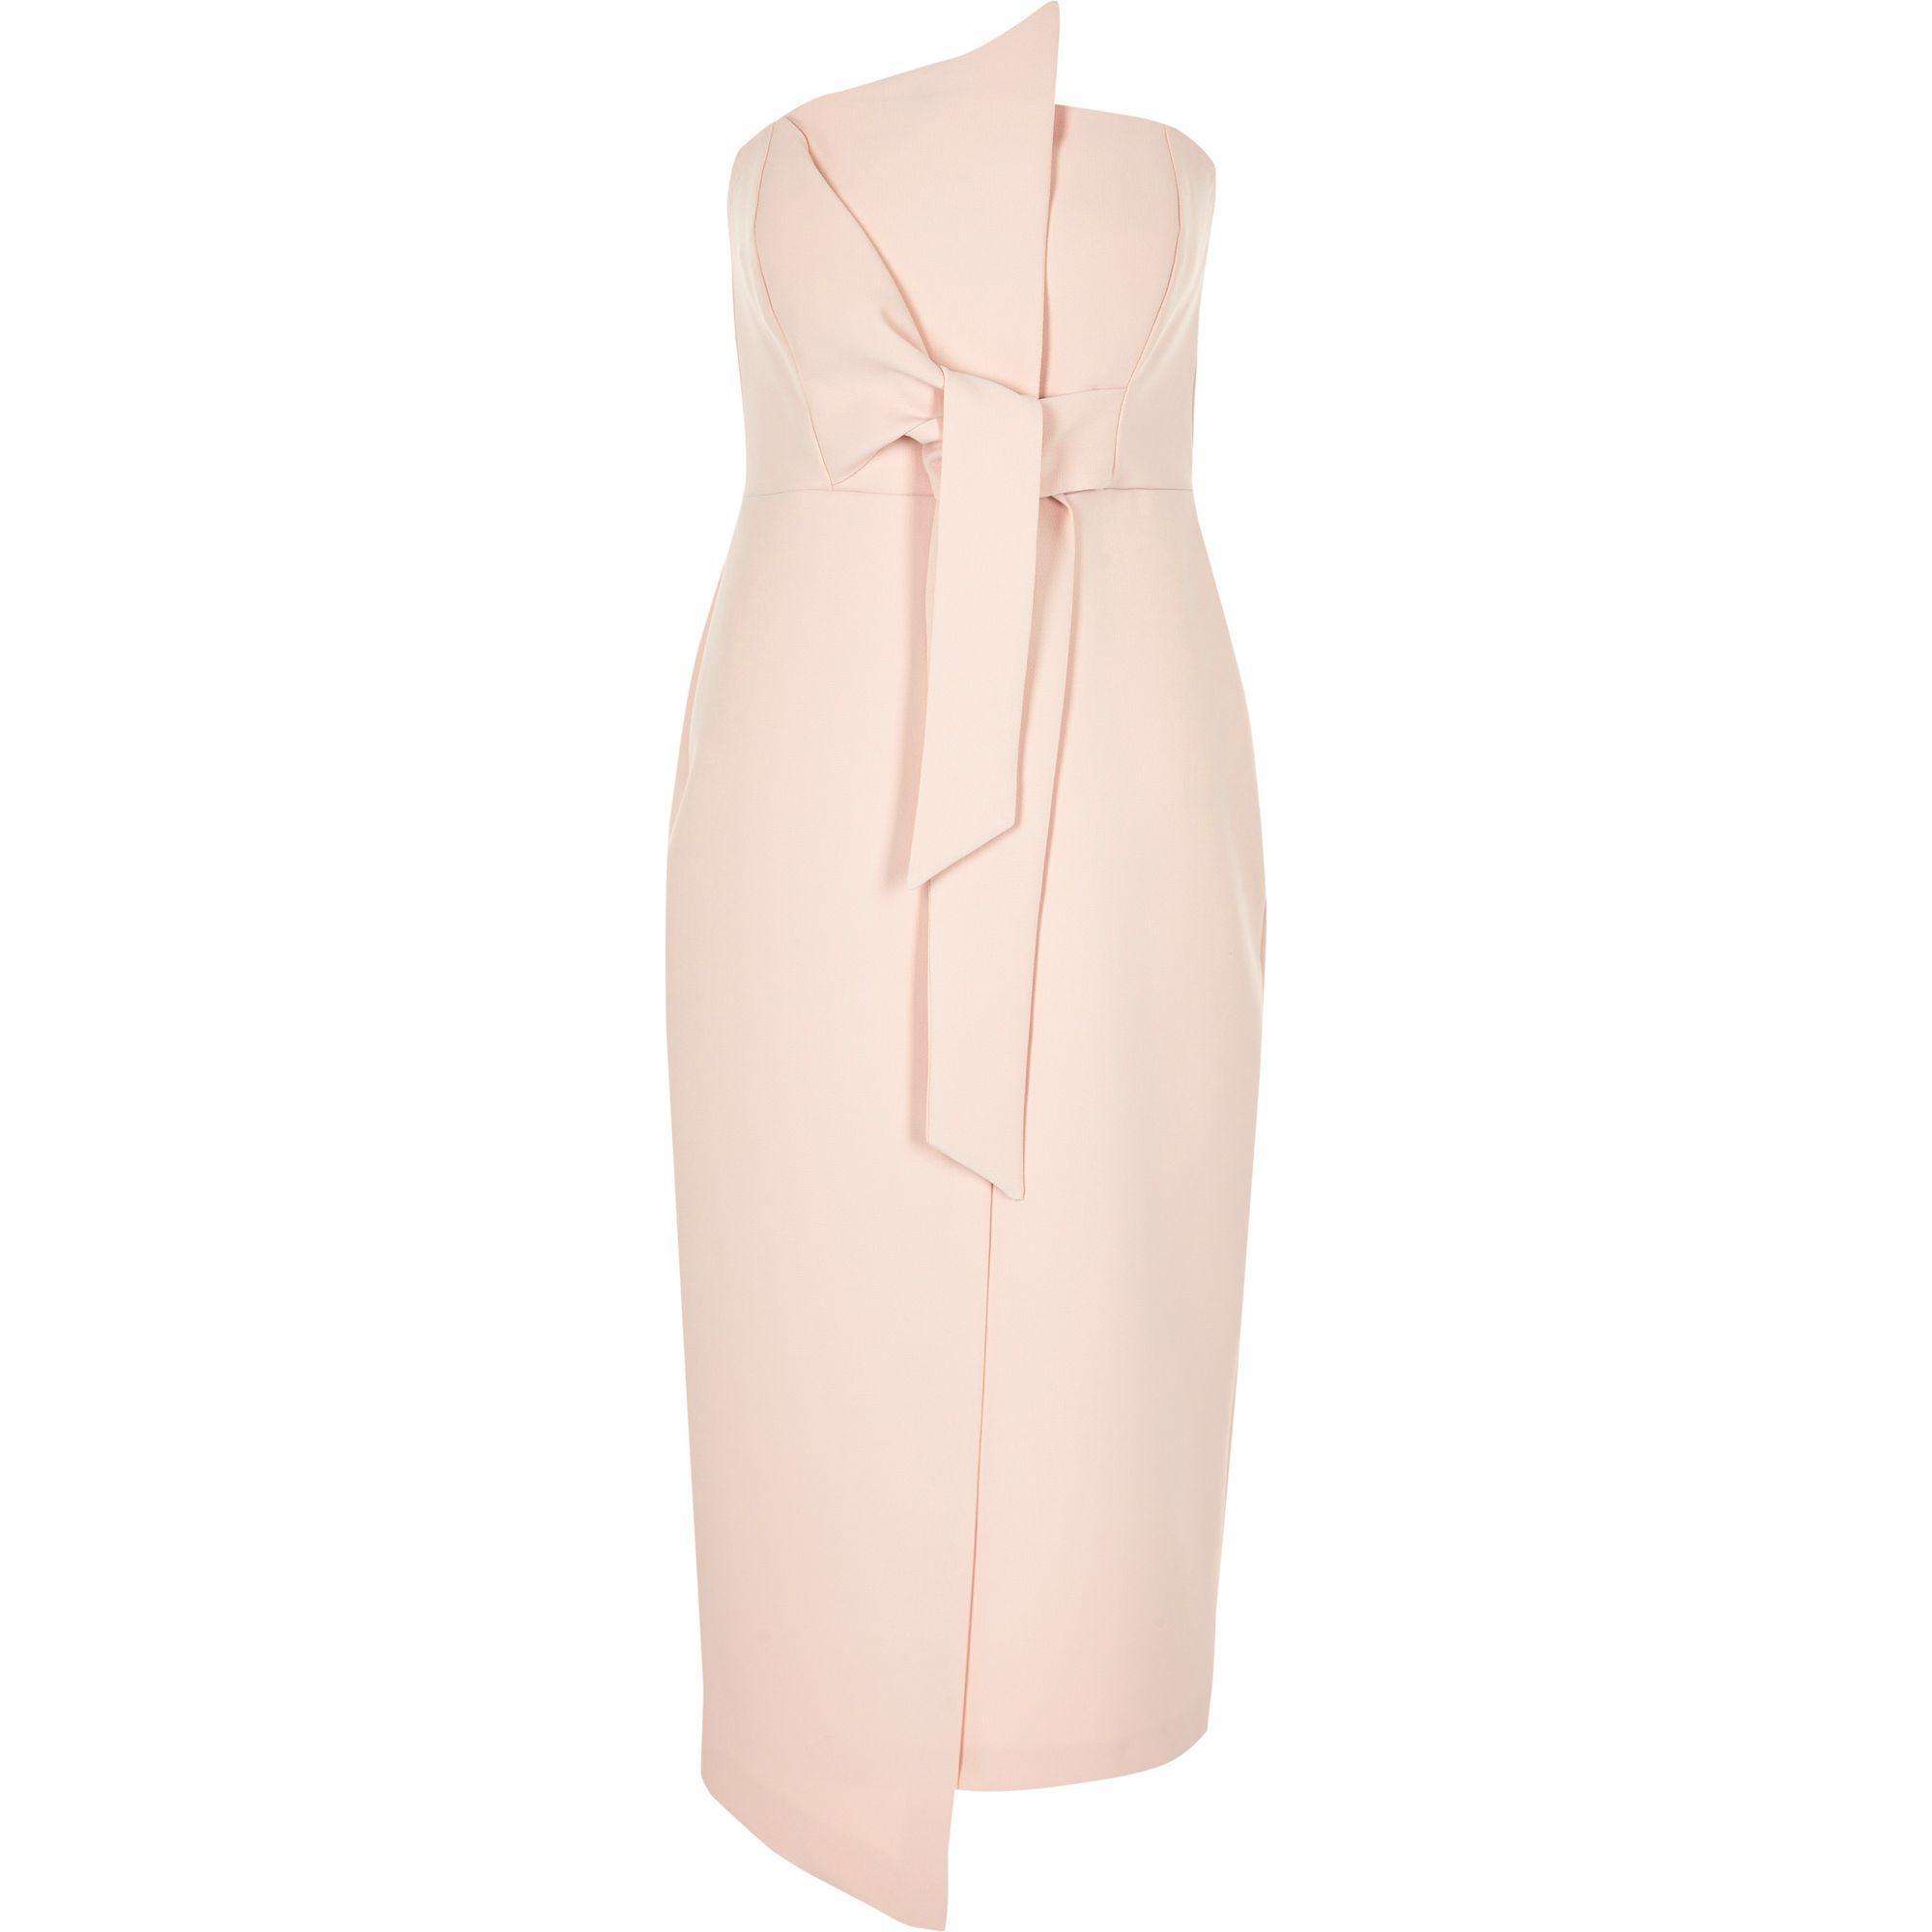 34954f2f0a4e7 River Island Petite Light Pink Bandeau Bodycon Midi Dress in Pink - Lyst